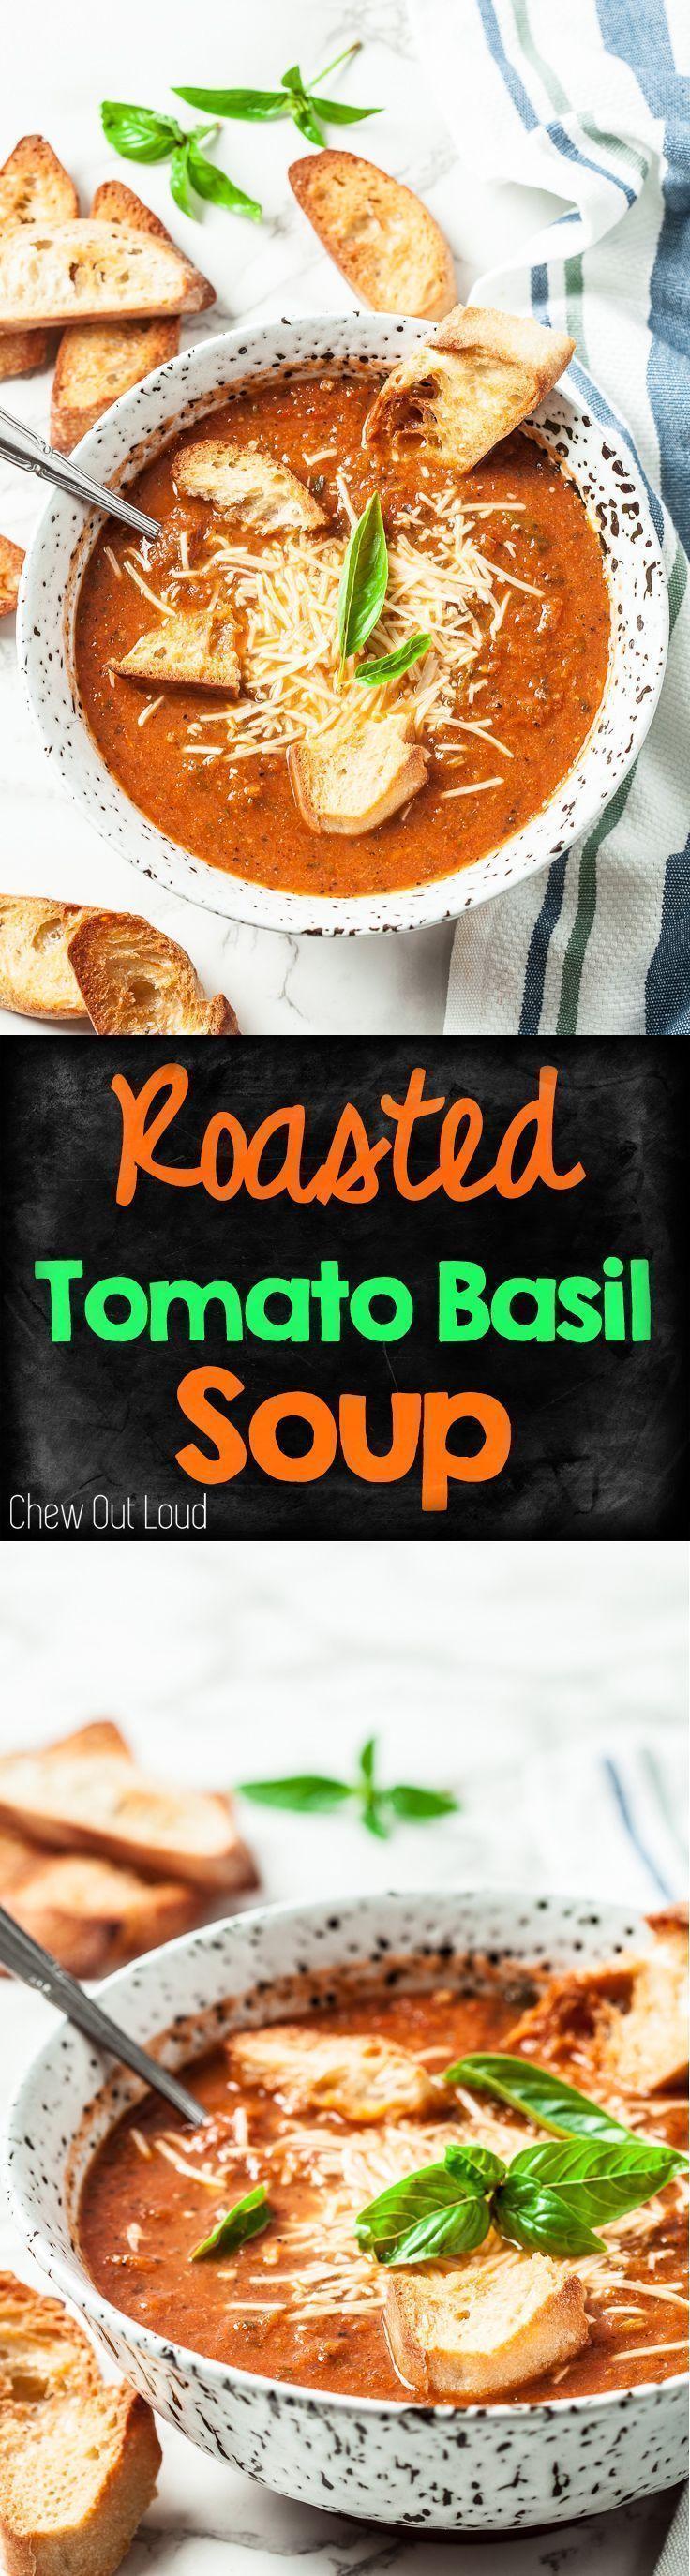 Roasted Tomato Basil Soup Rich 'n Skinny Roasted Tomato Basil Soup. It's both healthy and boldly flavorful.